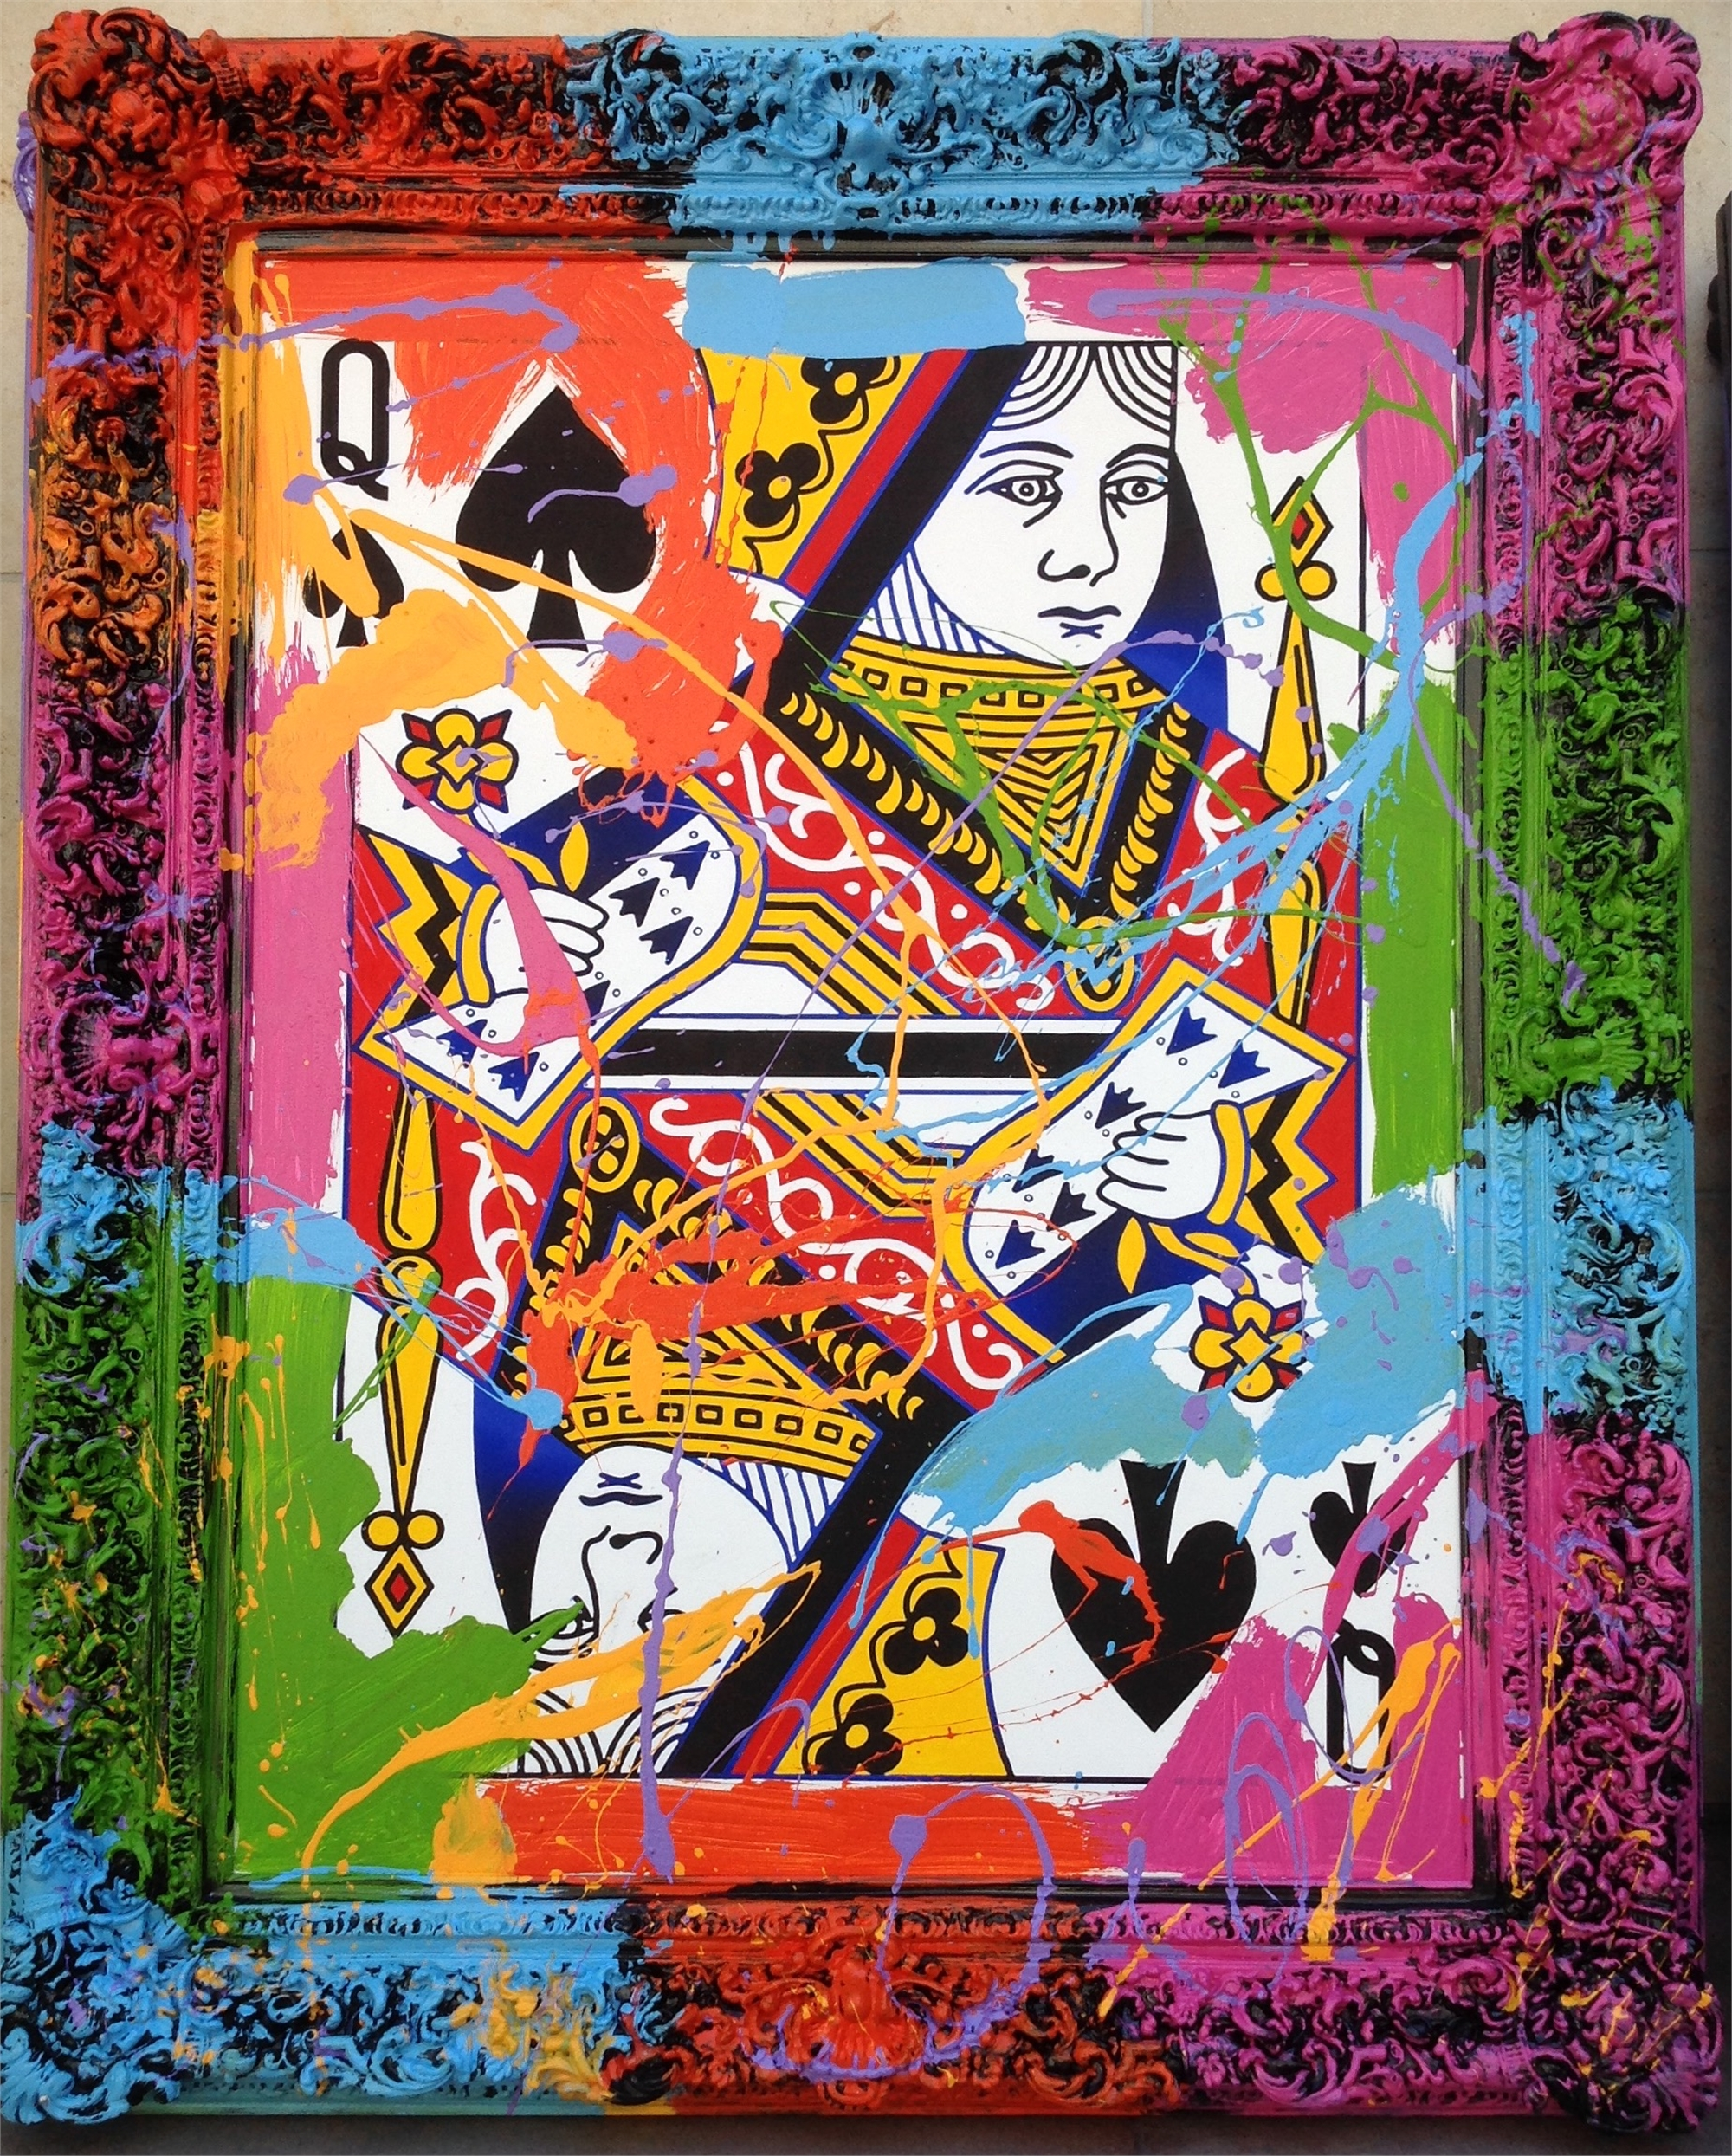 Queen of Spades by Elena Bulatova